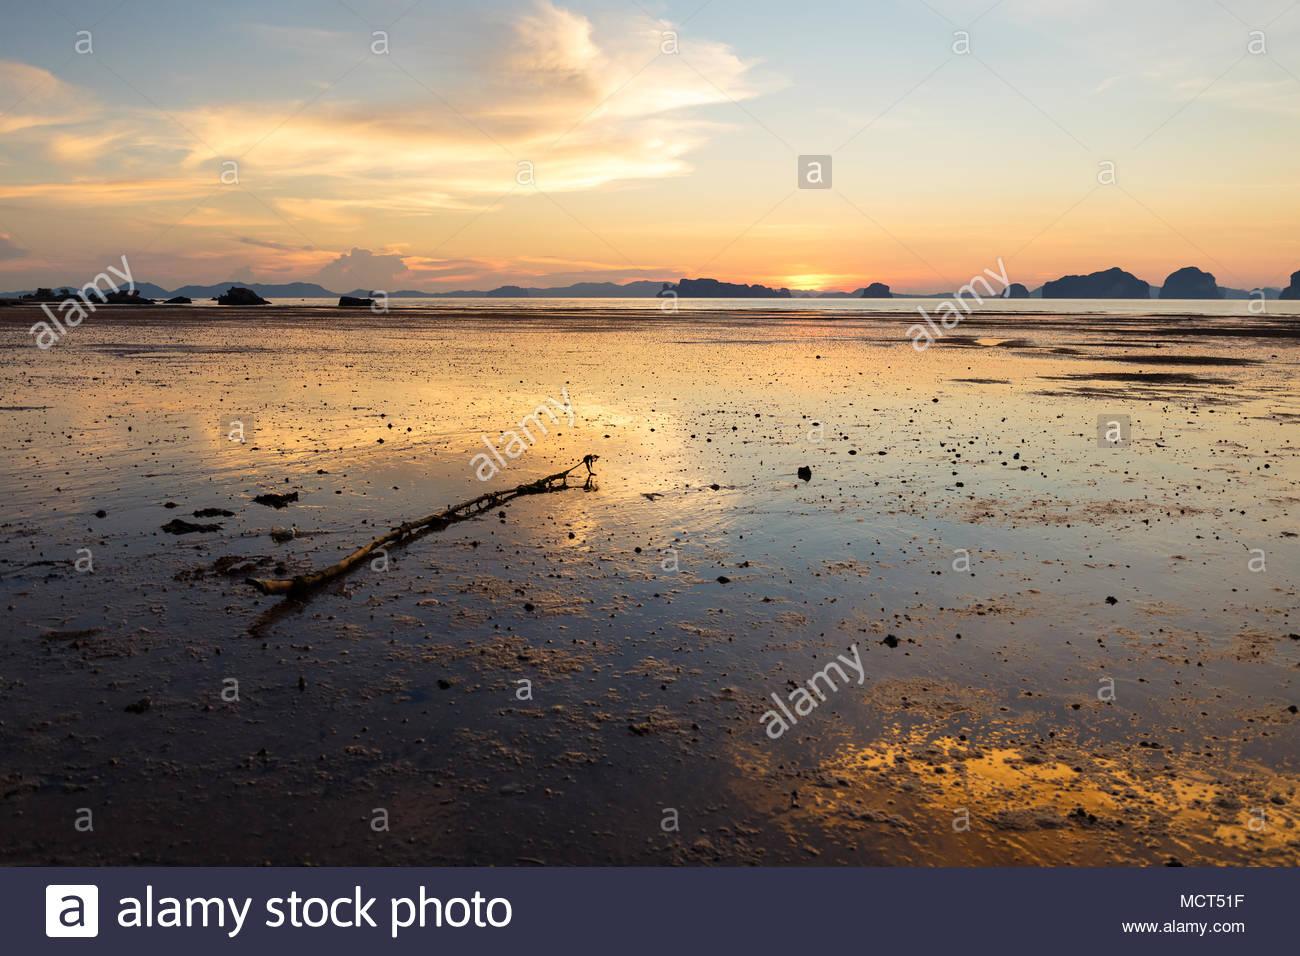 Sunset at Mueang Beach in Krabi Thailand - Stock Image